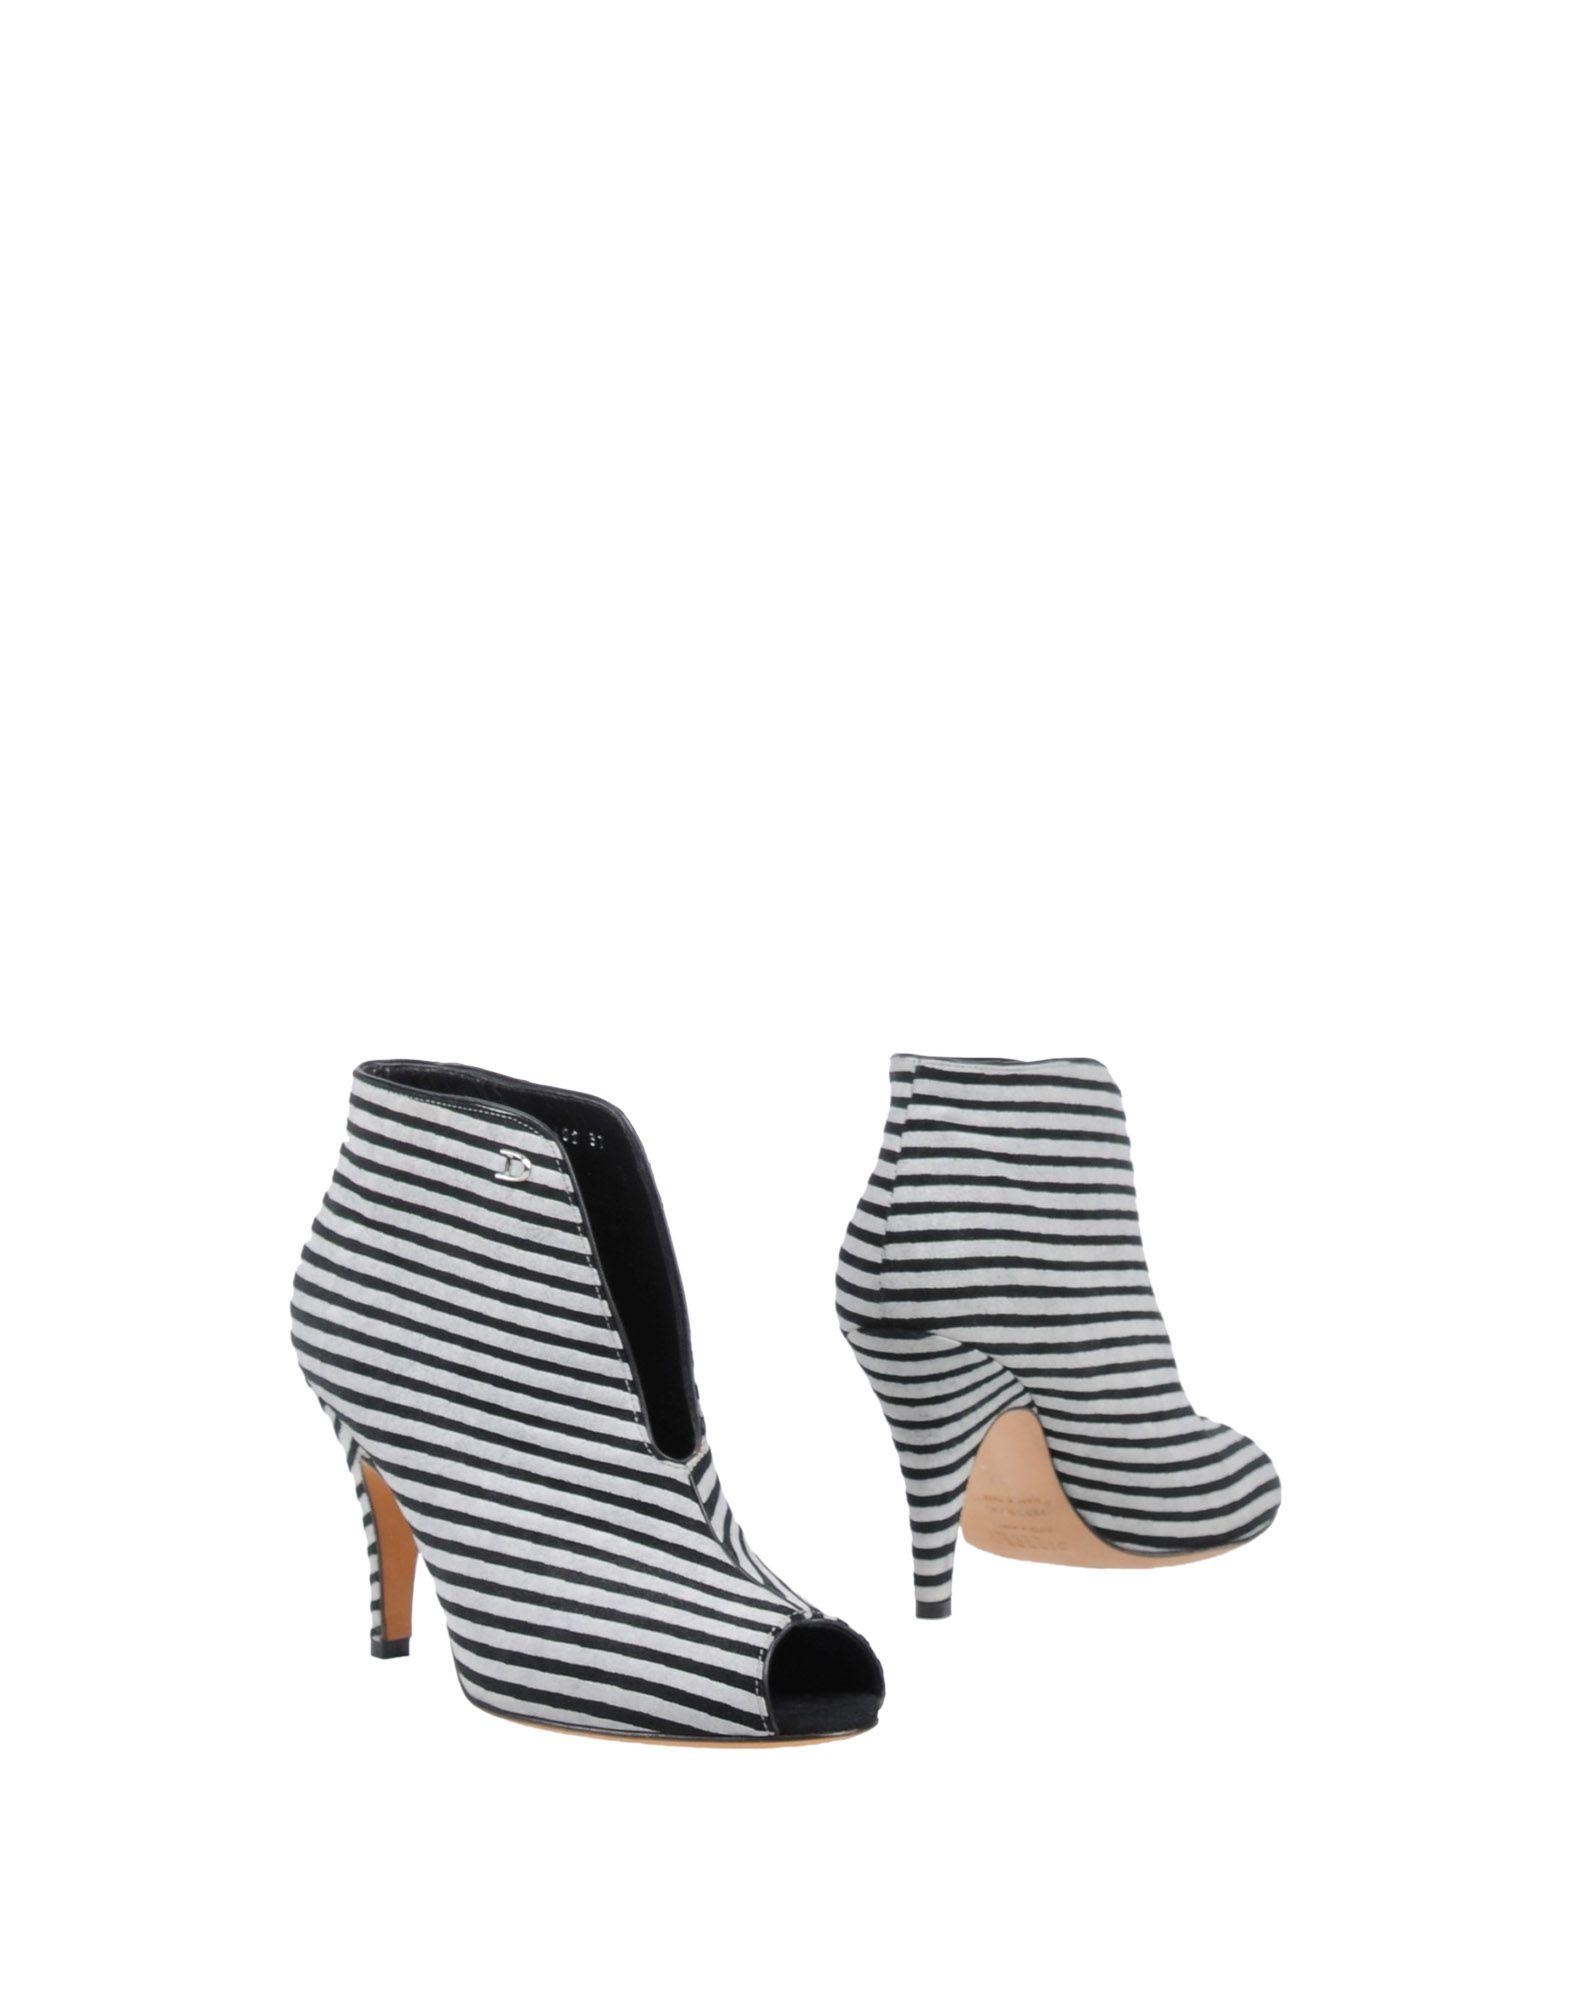 Dibrera By Paolo Zanoli Stiefelette Damen  11420422GI Gute Qualität beliebte Schuhe